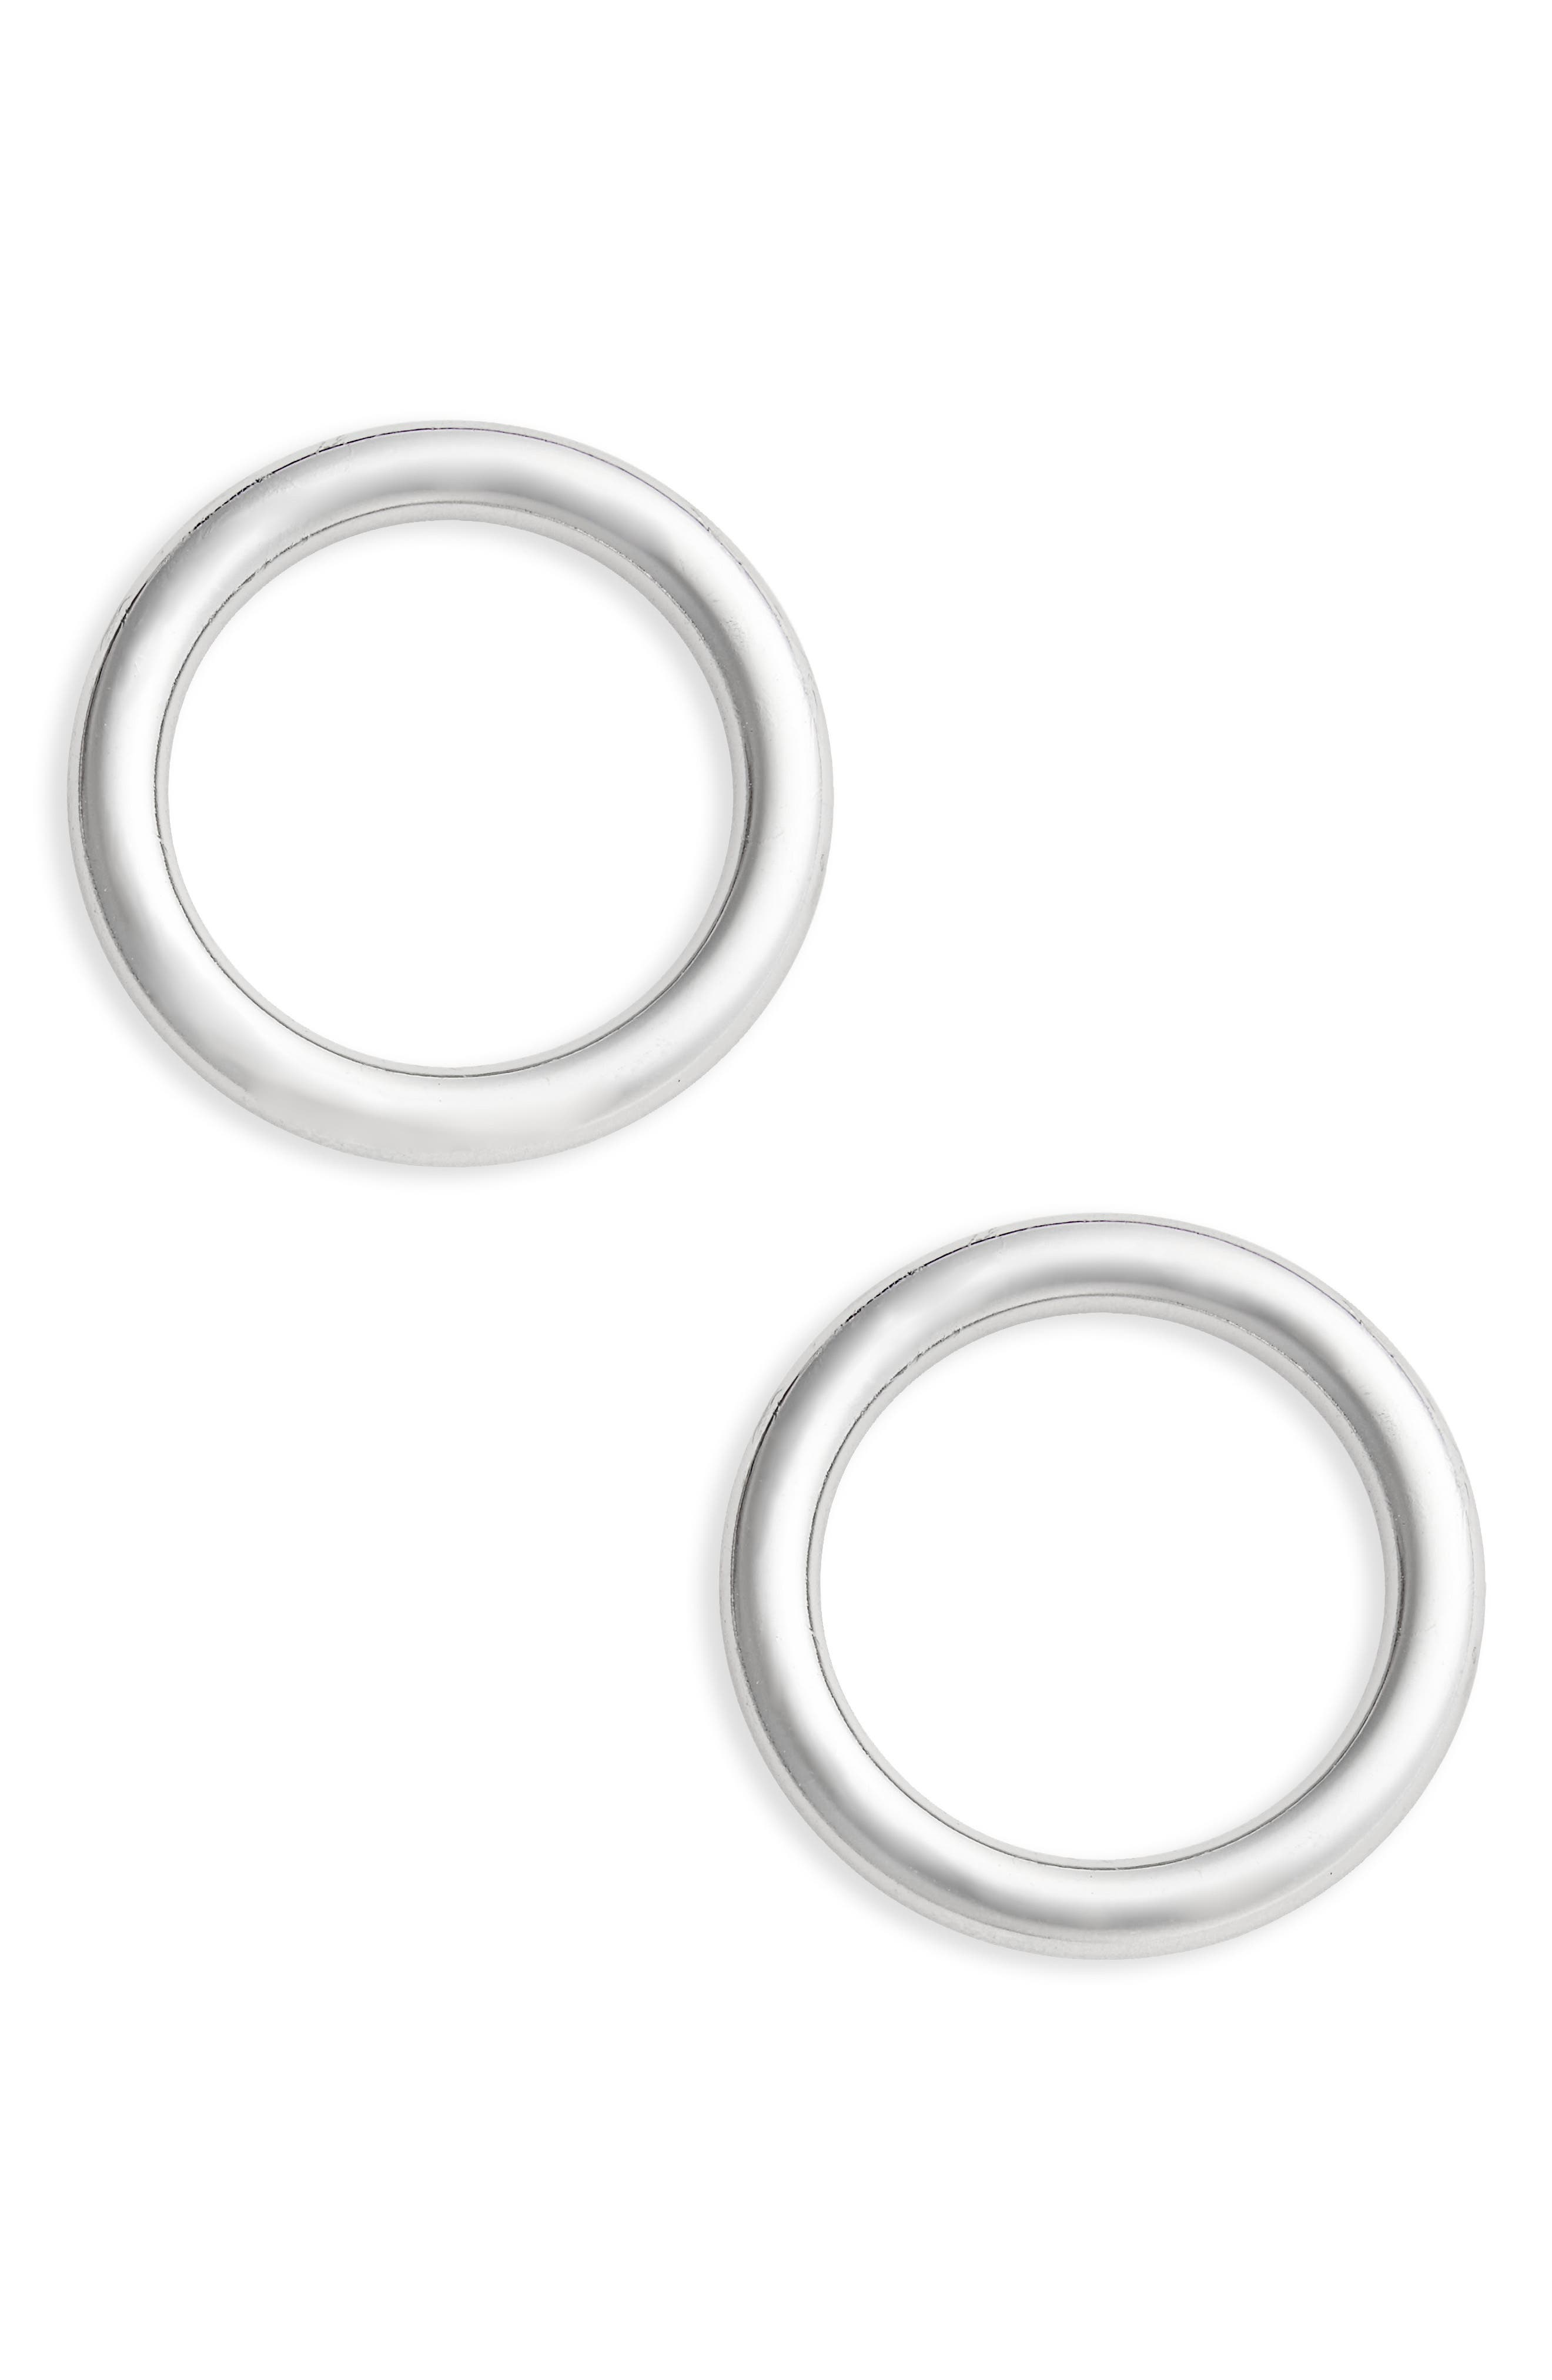 Circular Earrings,                         Main,                         color, 040